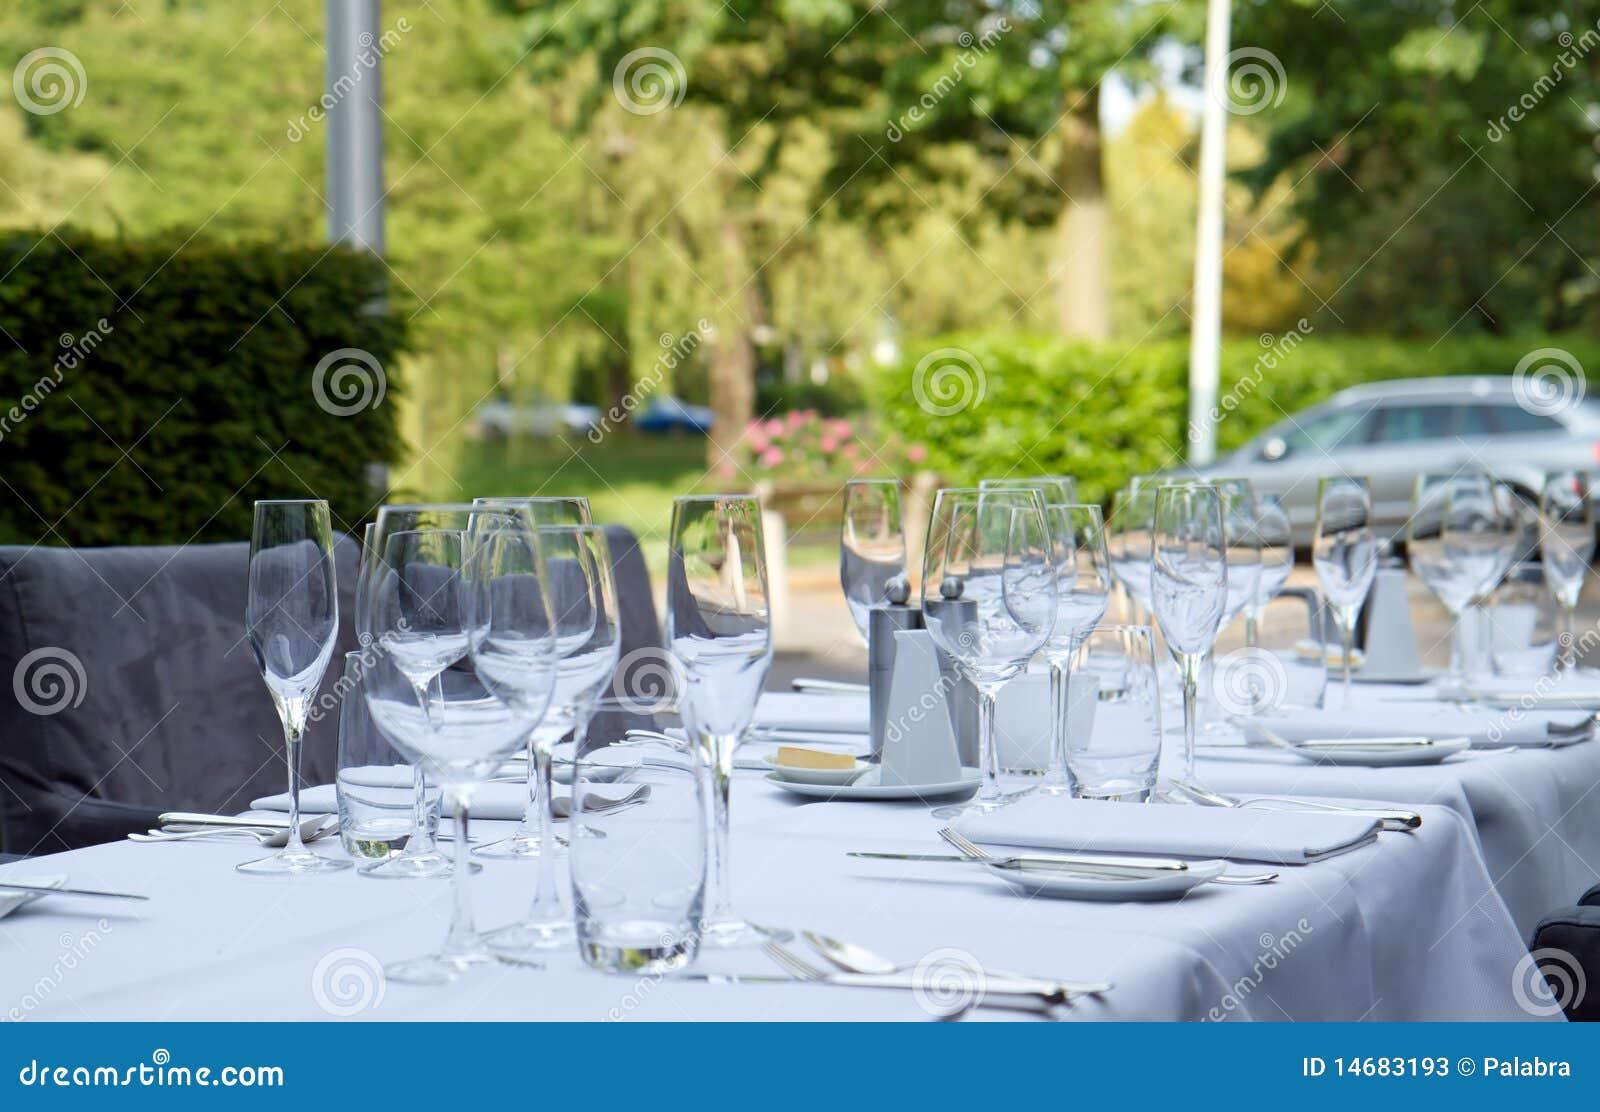 Dinner tables on terrace of star restaurant 3 stock photos for Dinner on the terrace